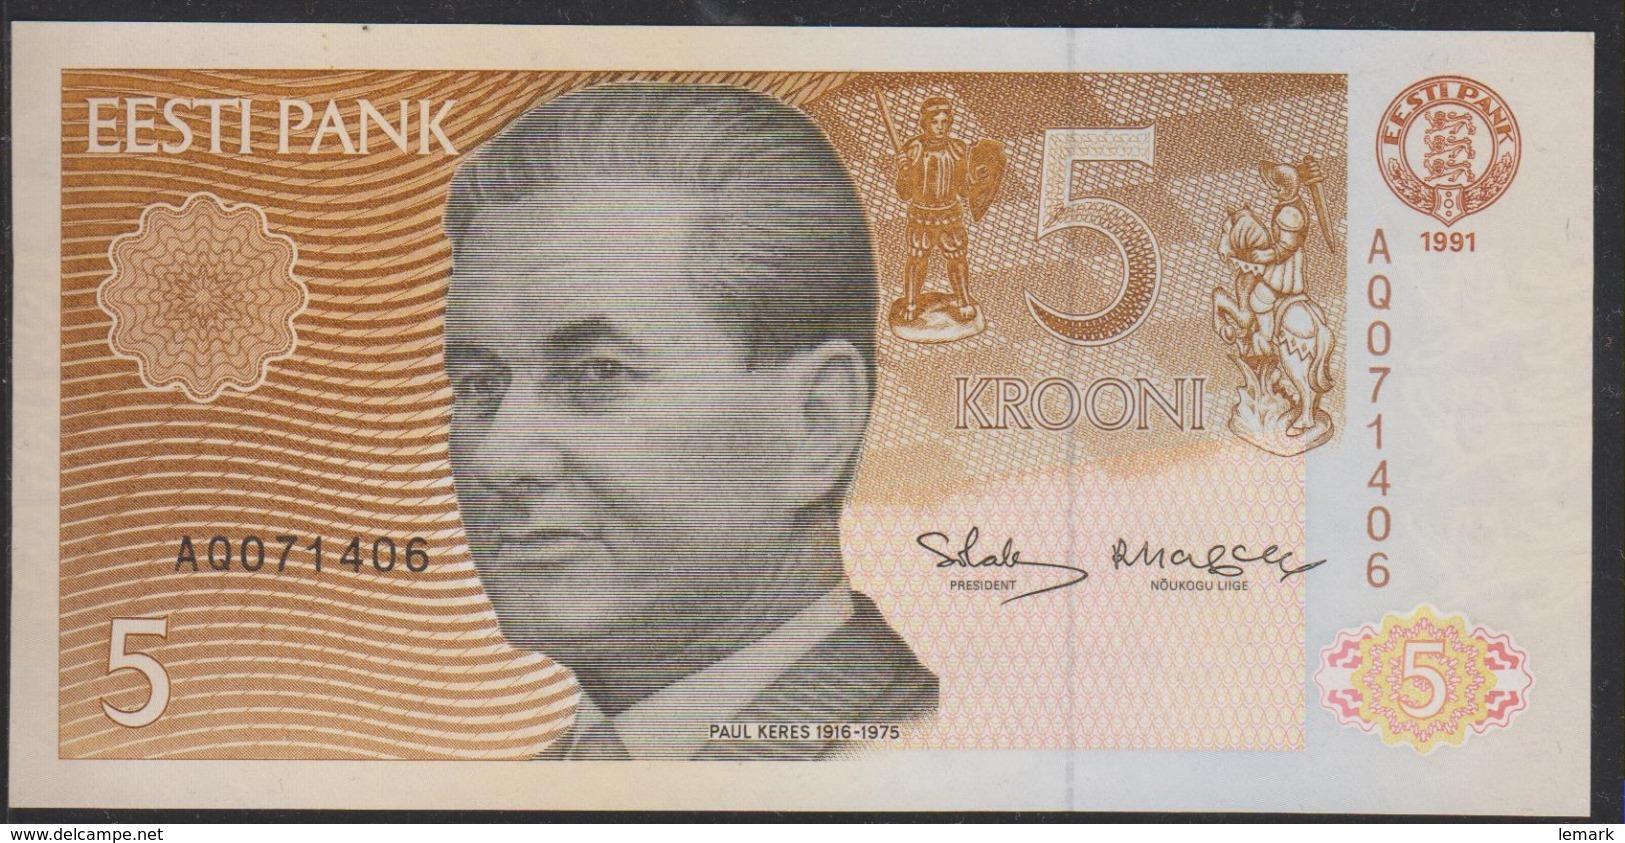 Estonia 5 Krooni 1991 P71a UNC - Estonia